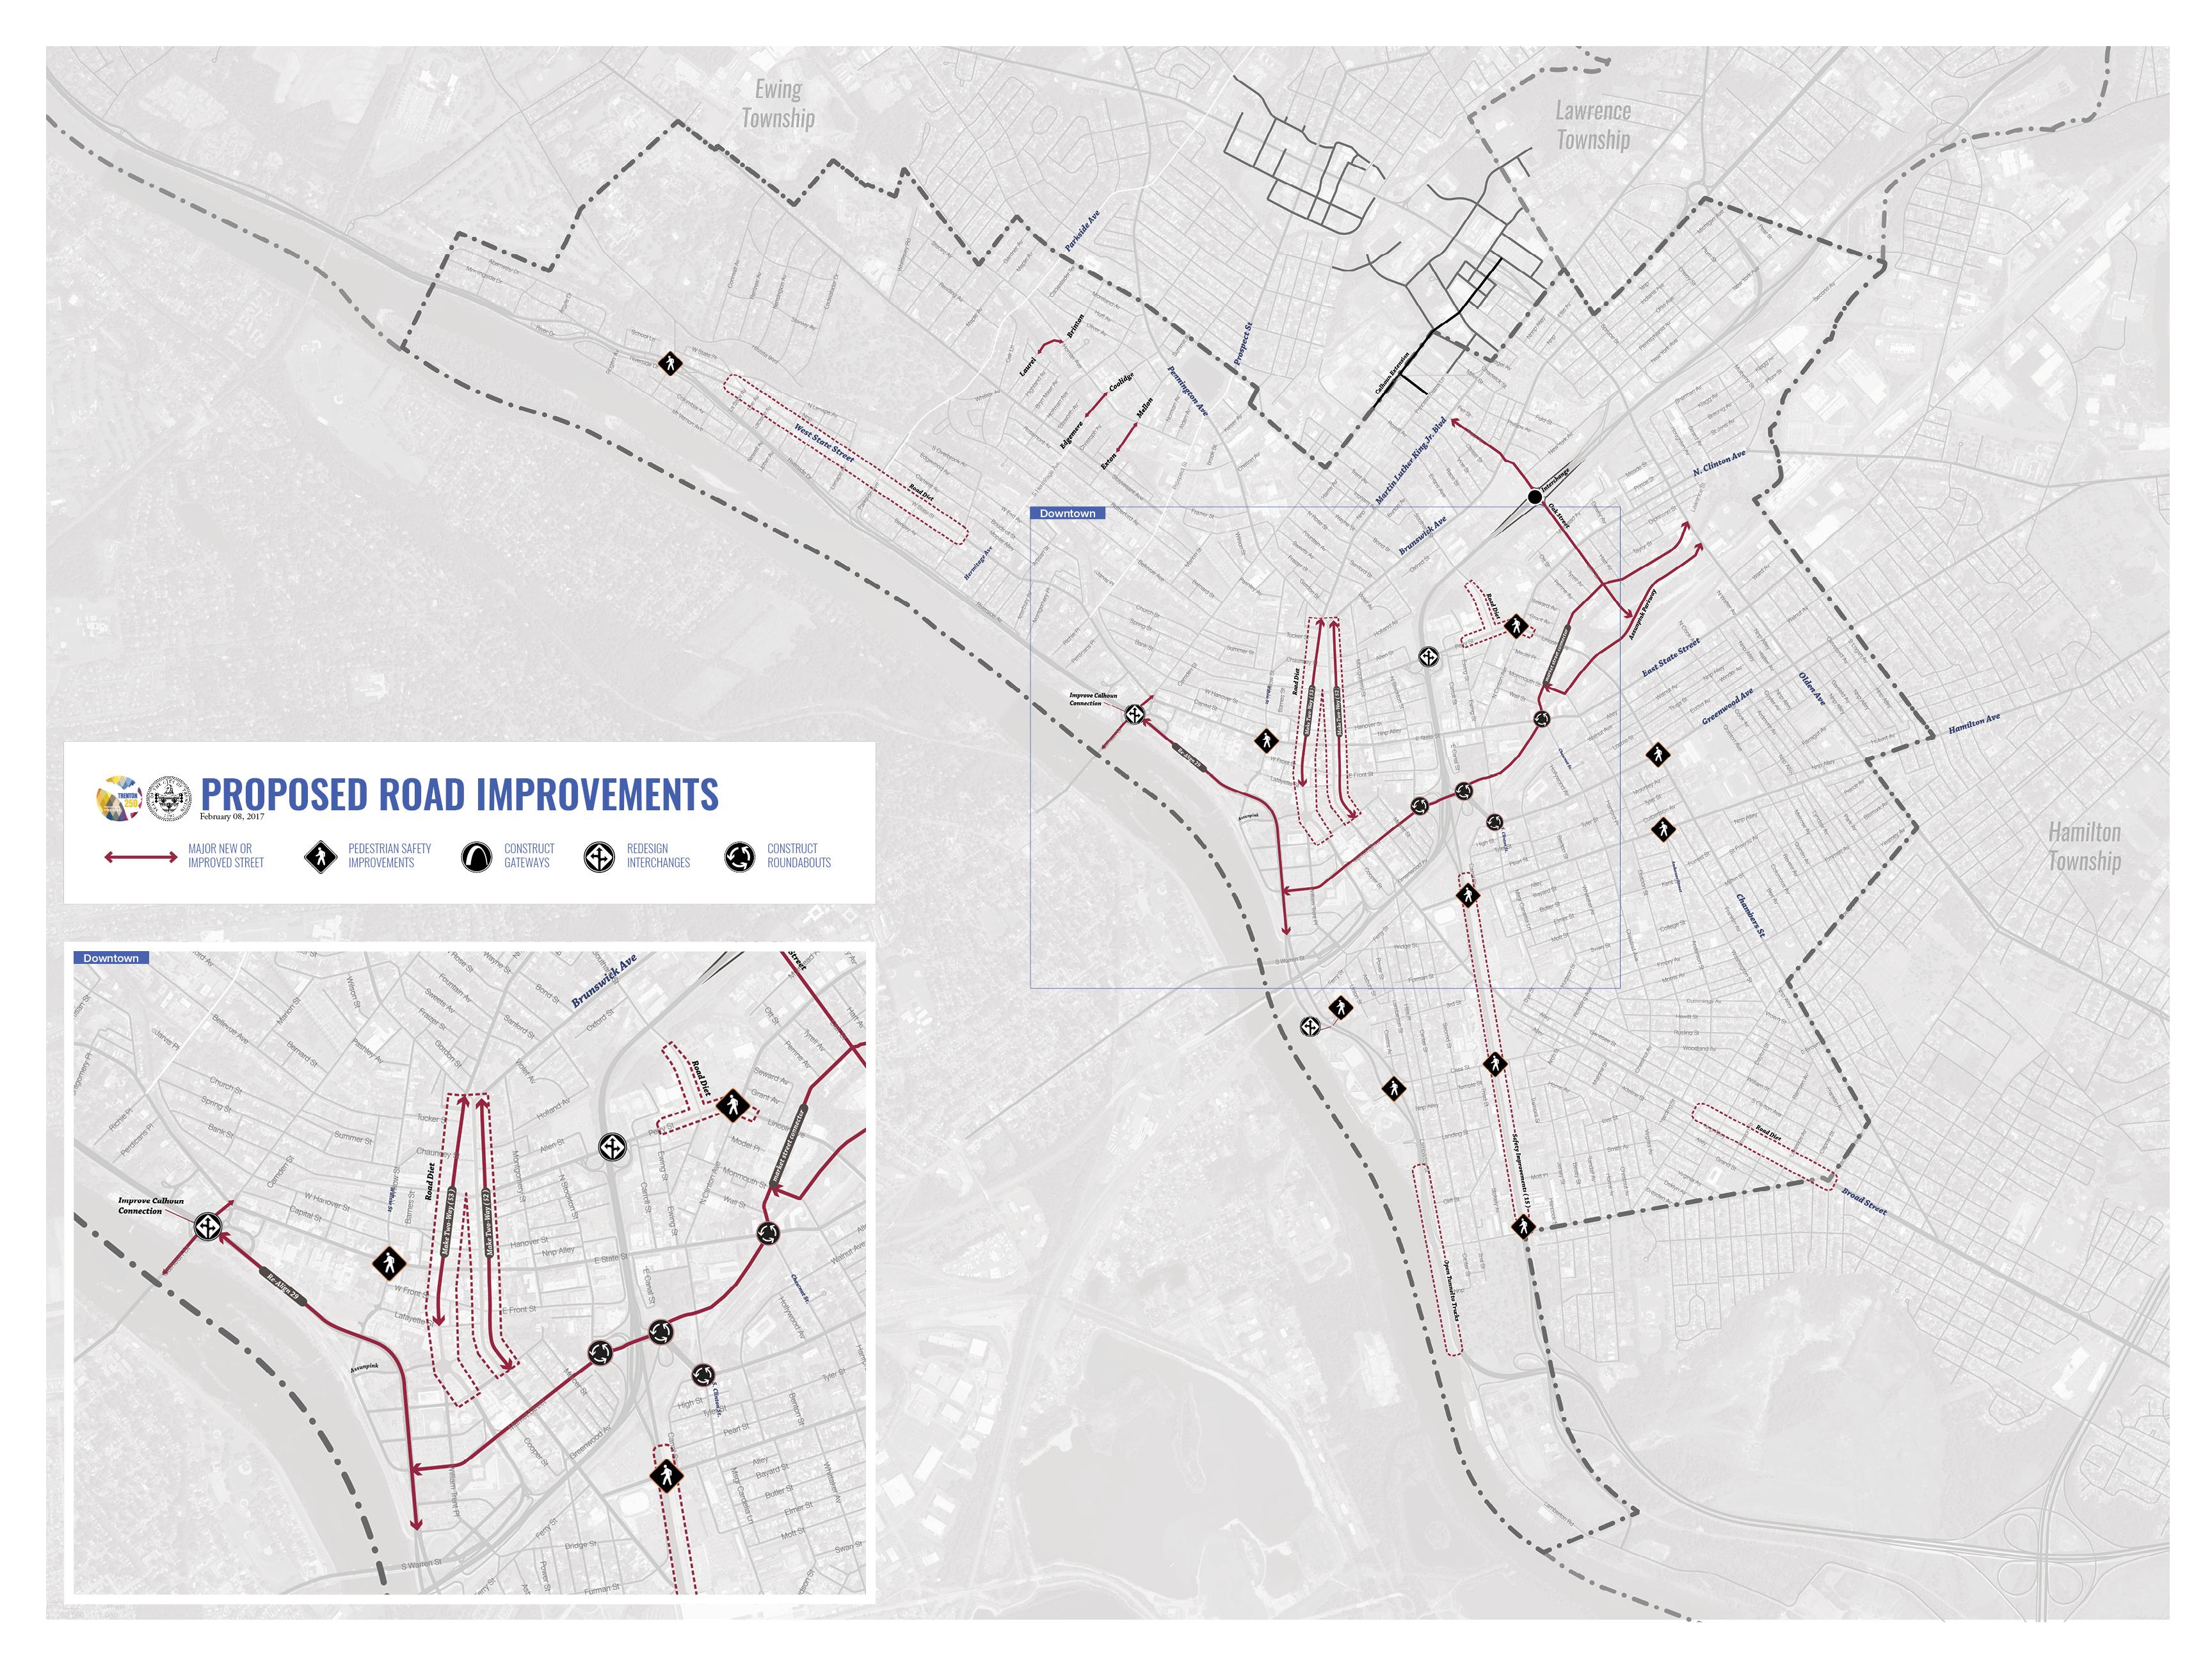 Trenton 250 Road Improvements Map